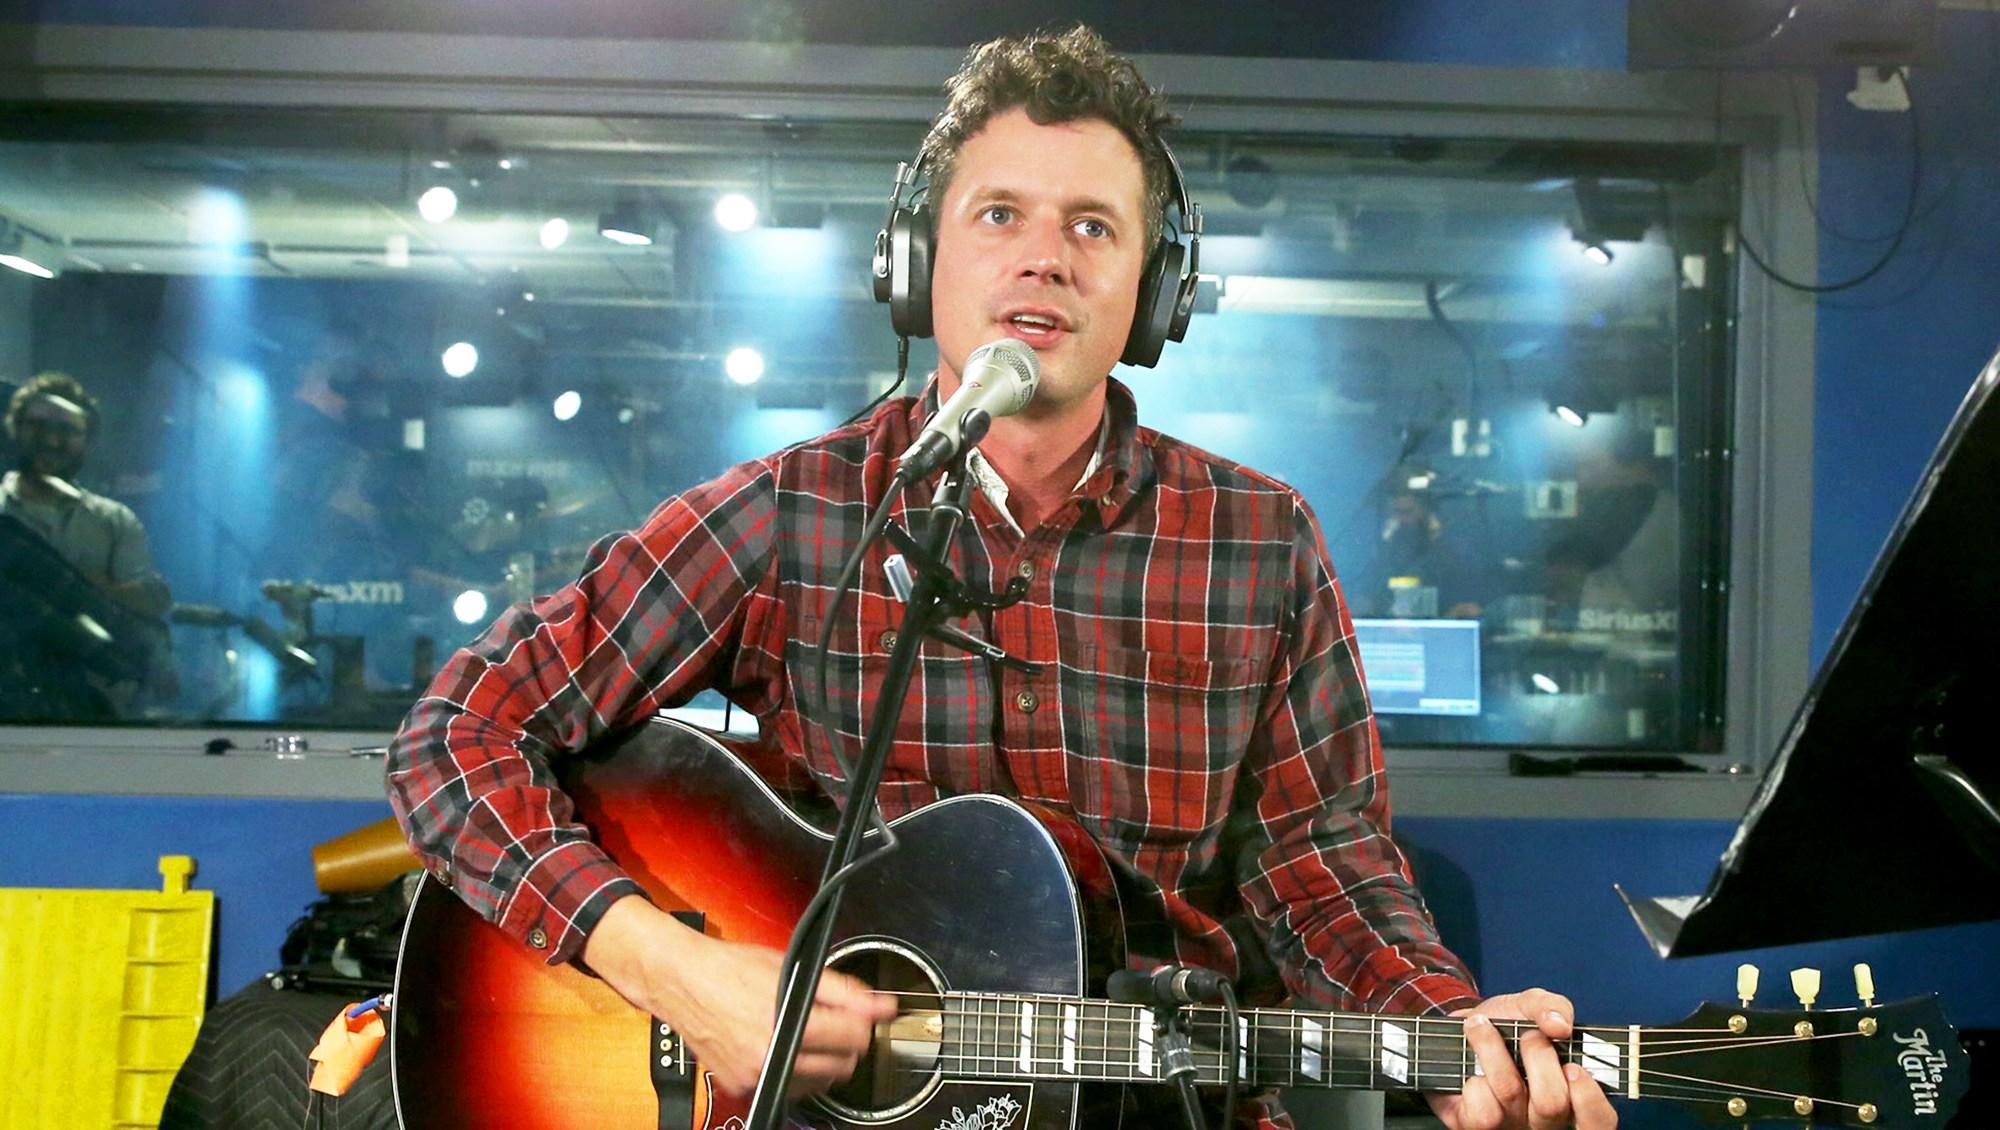 Evan Felker of Turnpike Troubadours performs at SiriusXM Studios on October 26, 2017 in New York City.